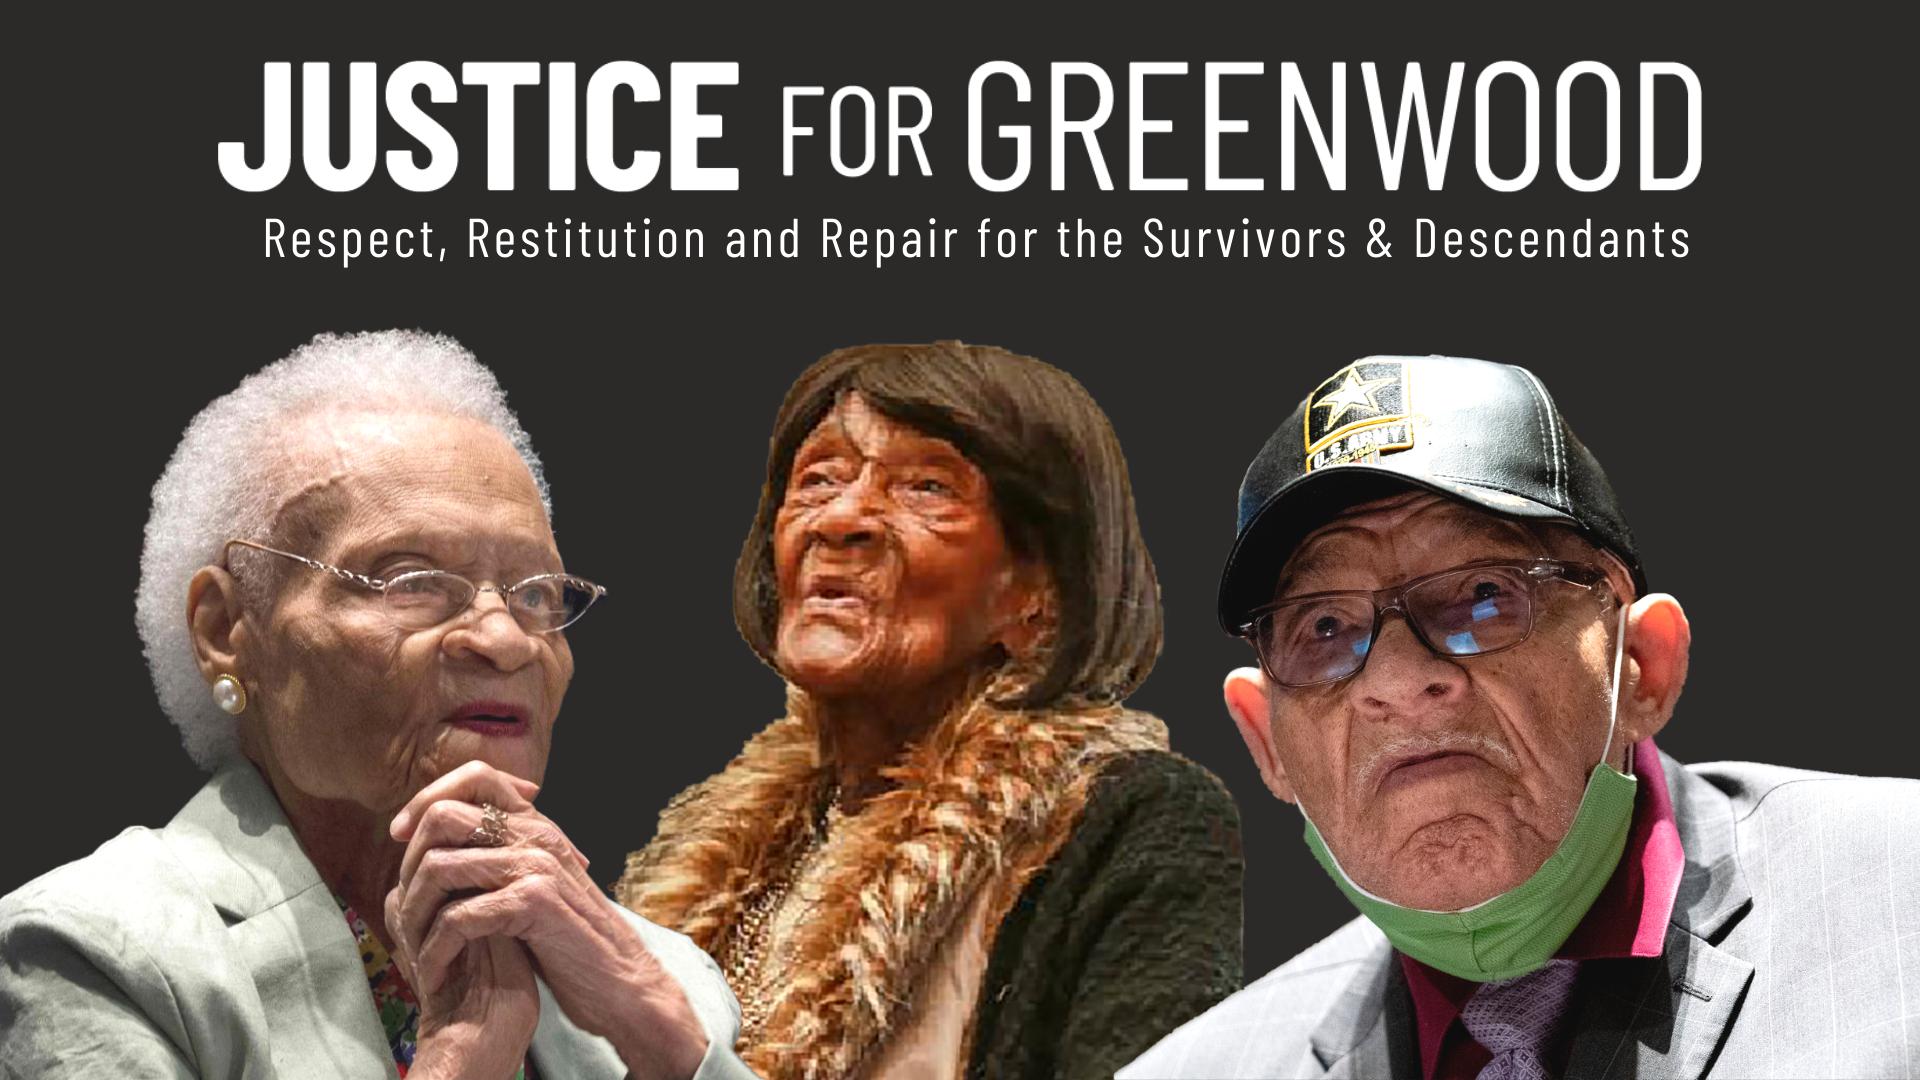 Respect__restitution_and_repair_for_the_survivors___descendants_(1)